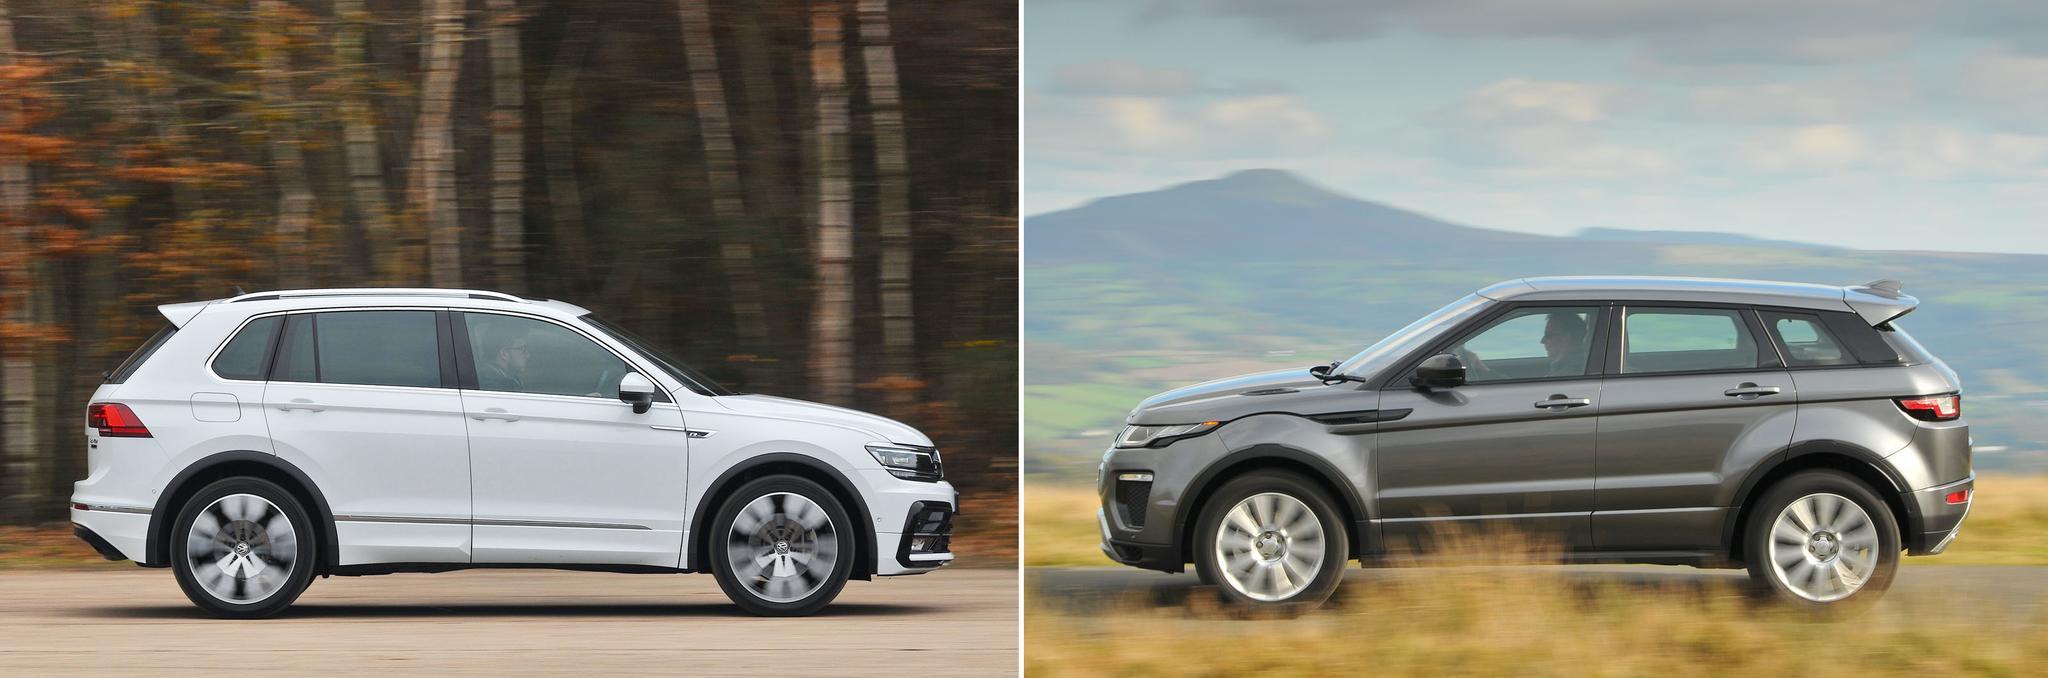 New Volkswagen Tiguan vs used Range Rover Evoque: which is best?